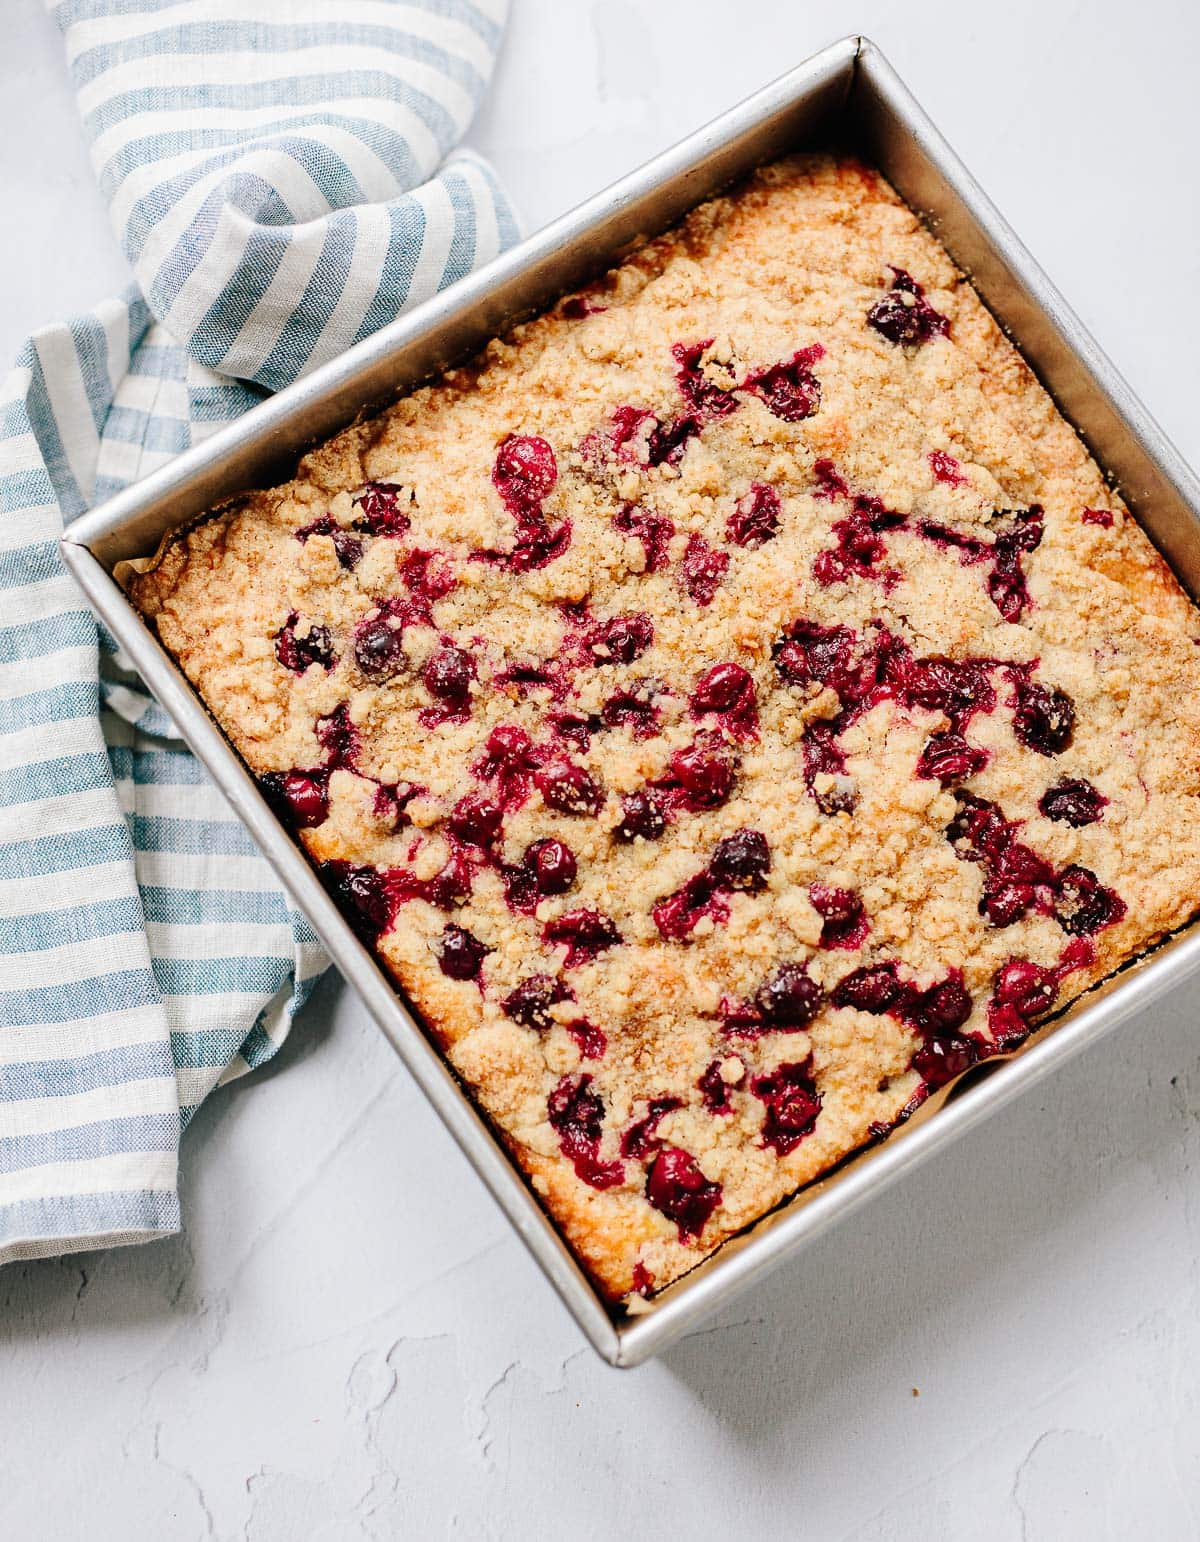 Cranberry Crumb Cake